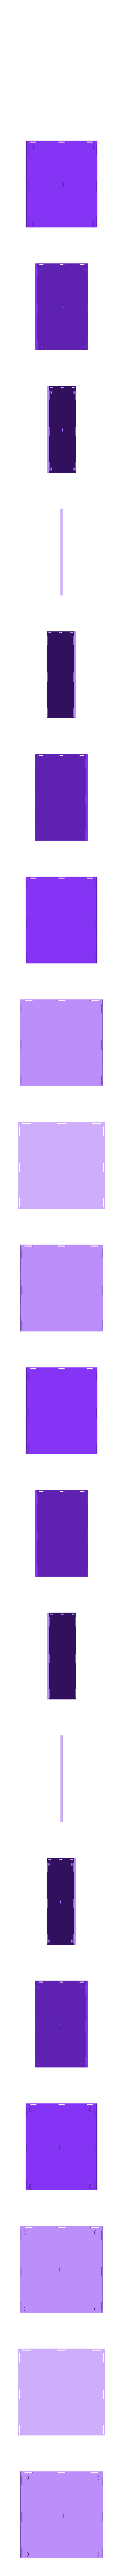 Tapa.stl Download STL file Modular desktop organizer • 3D printing design, LnZProd